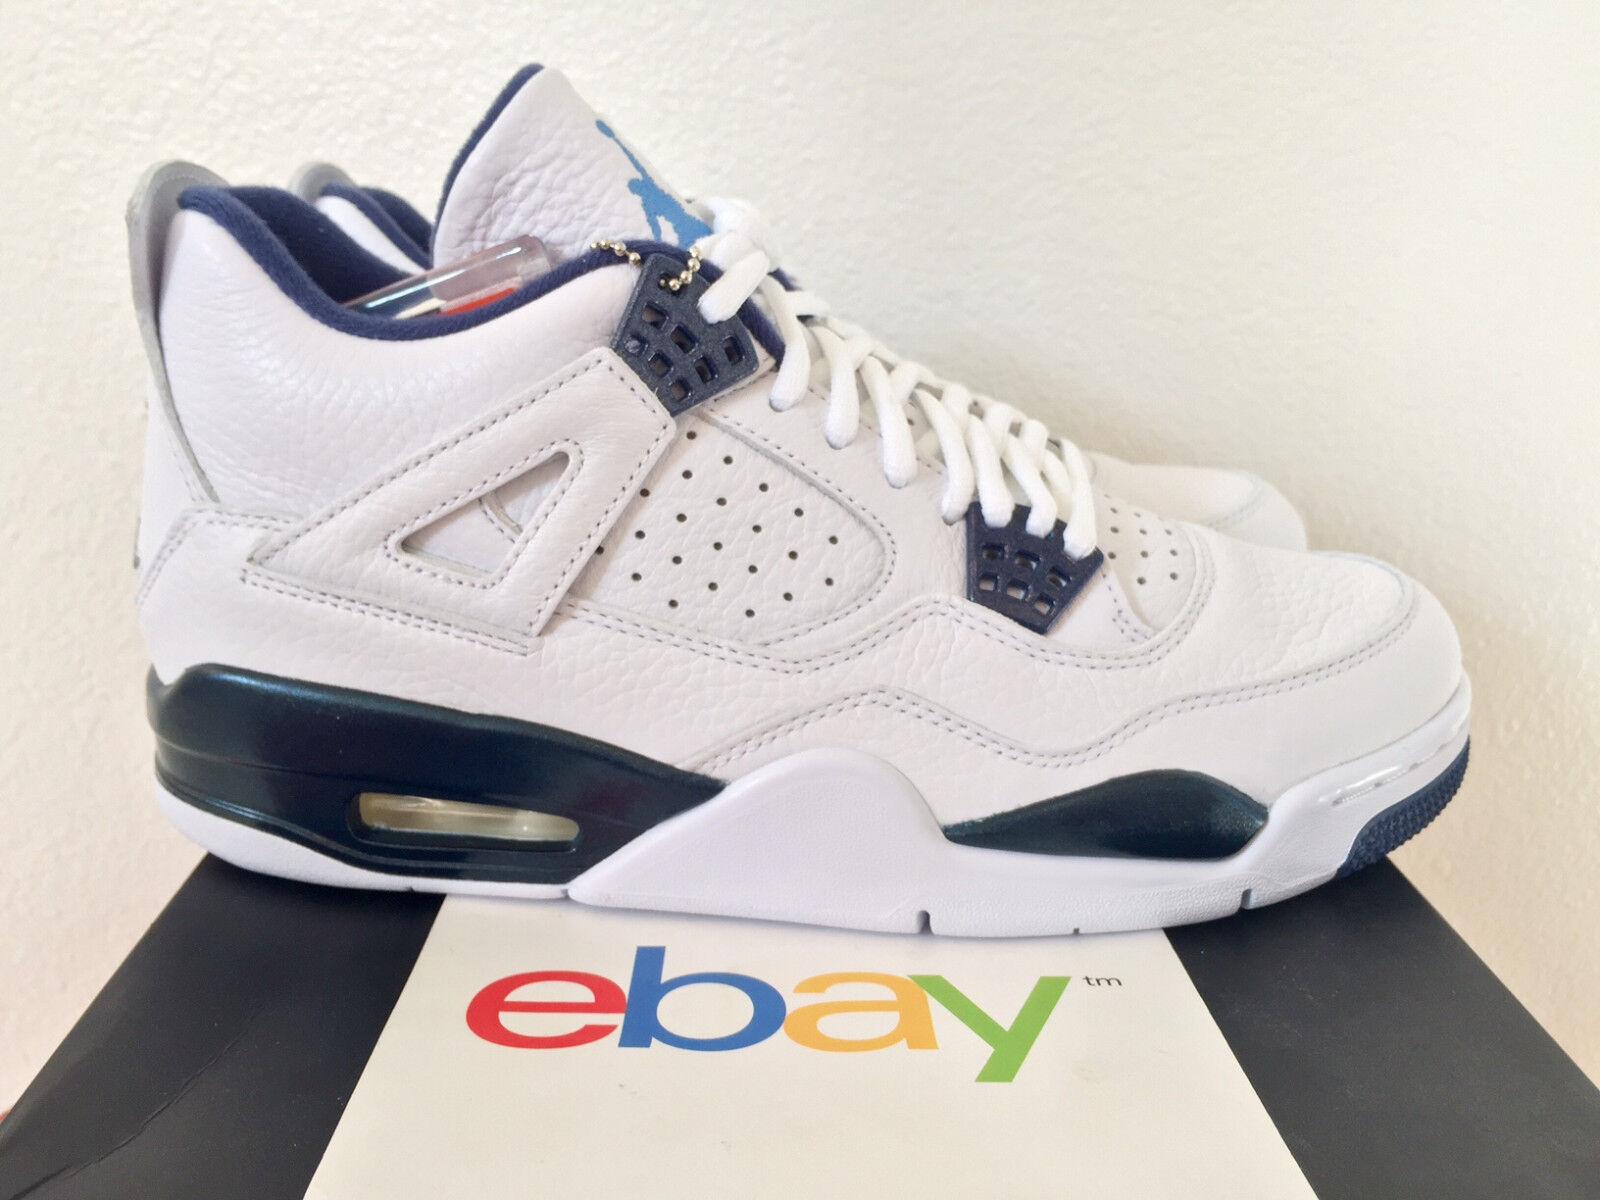 2018 DS Air Jordan 4 Retro iv LEGEND BLUE Sizes 8.5-13 columbia white 314254 107